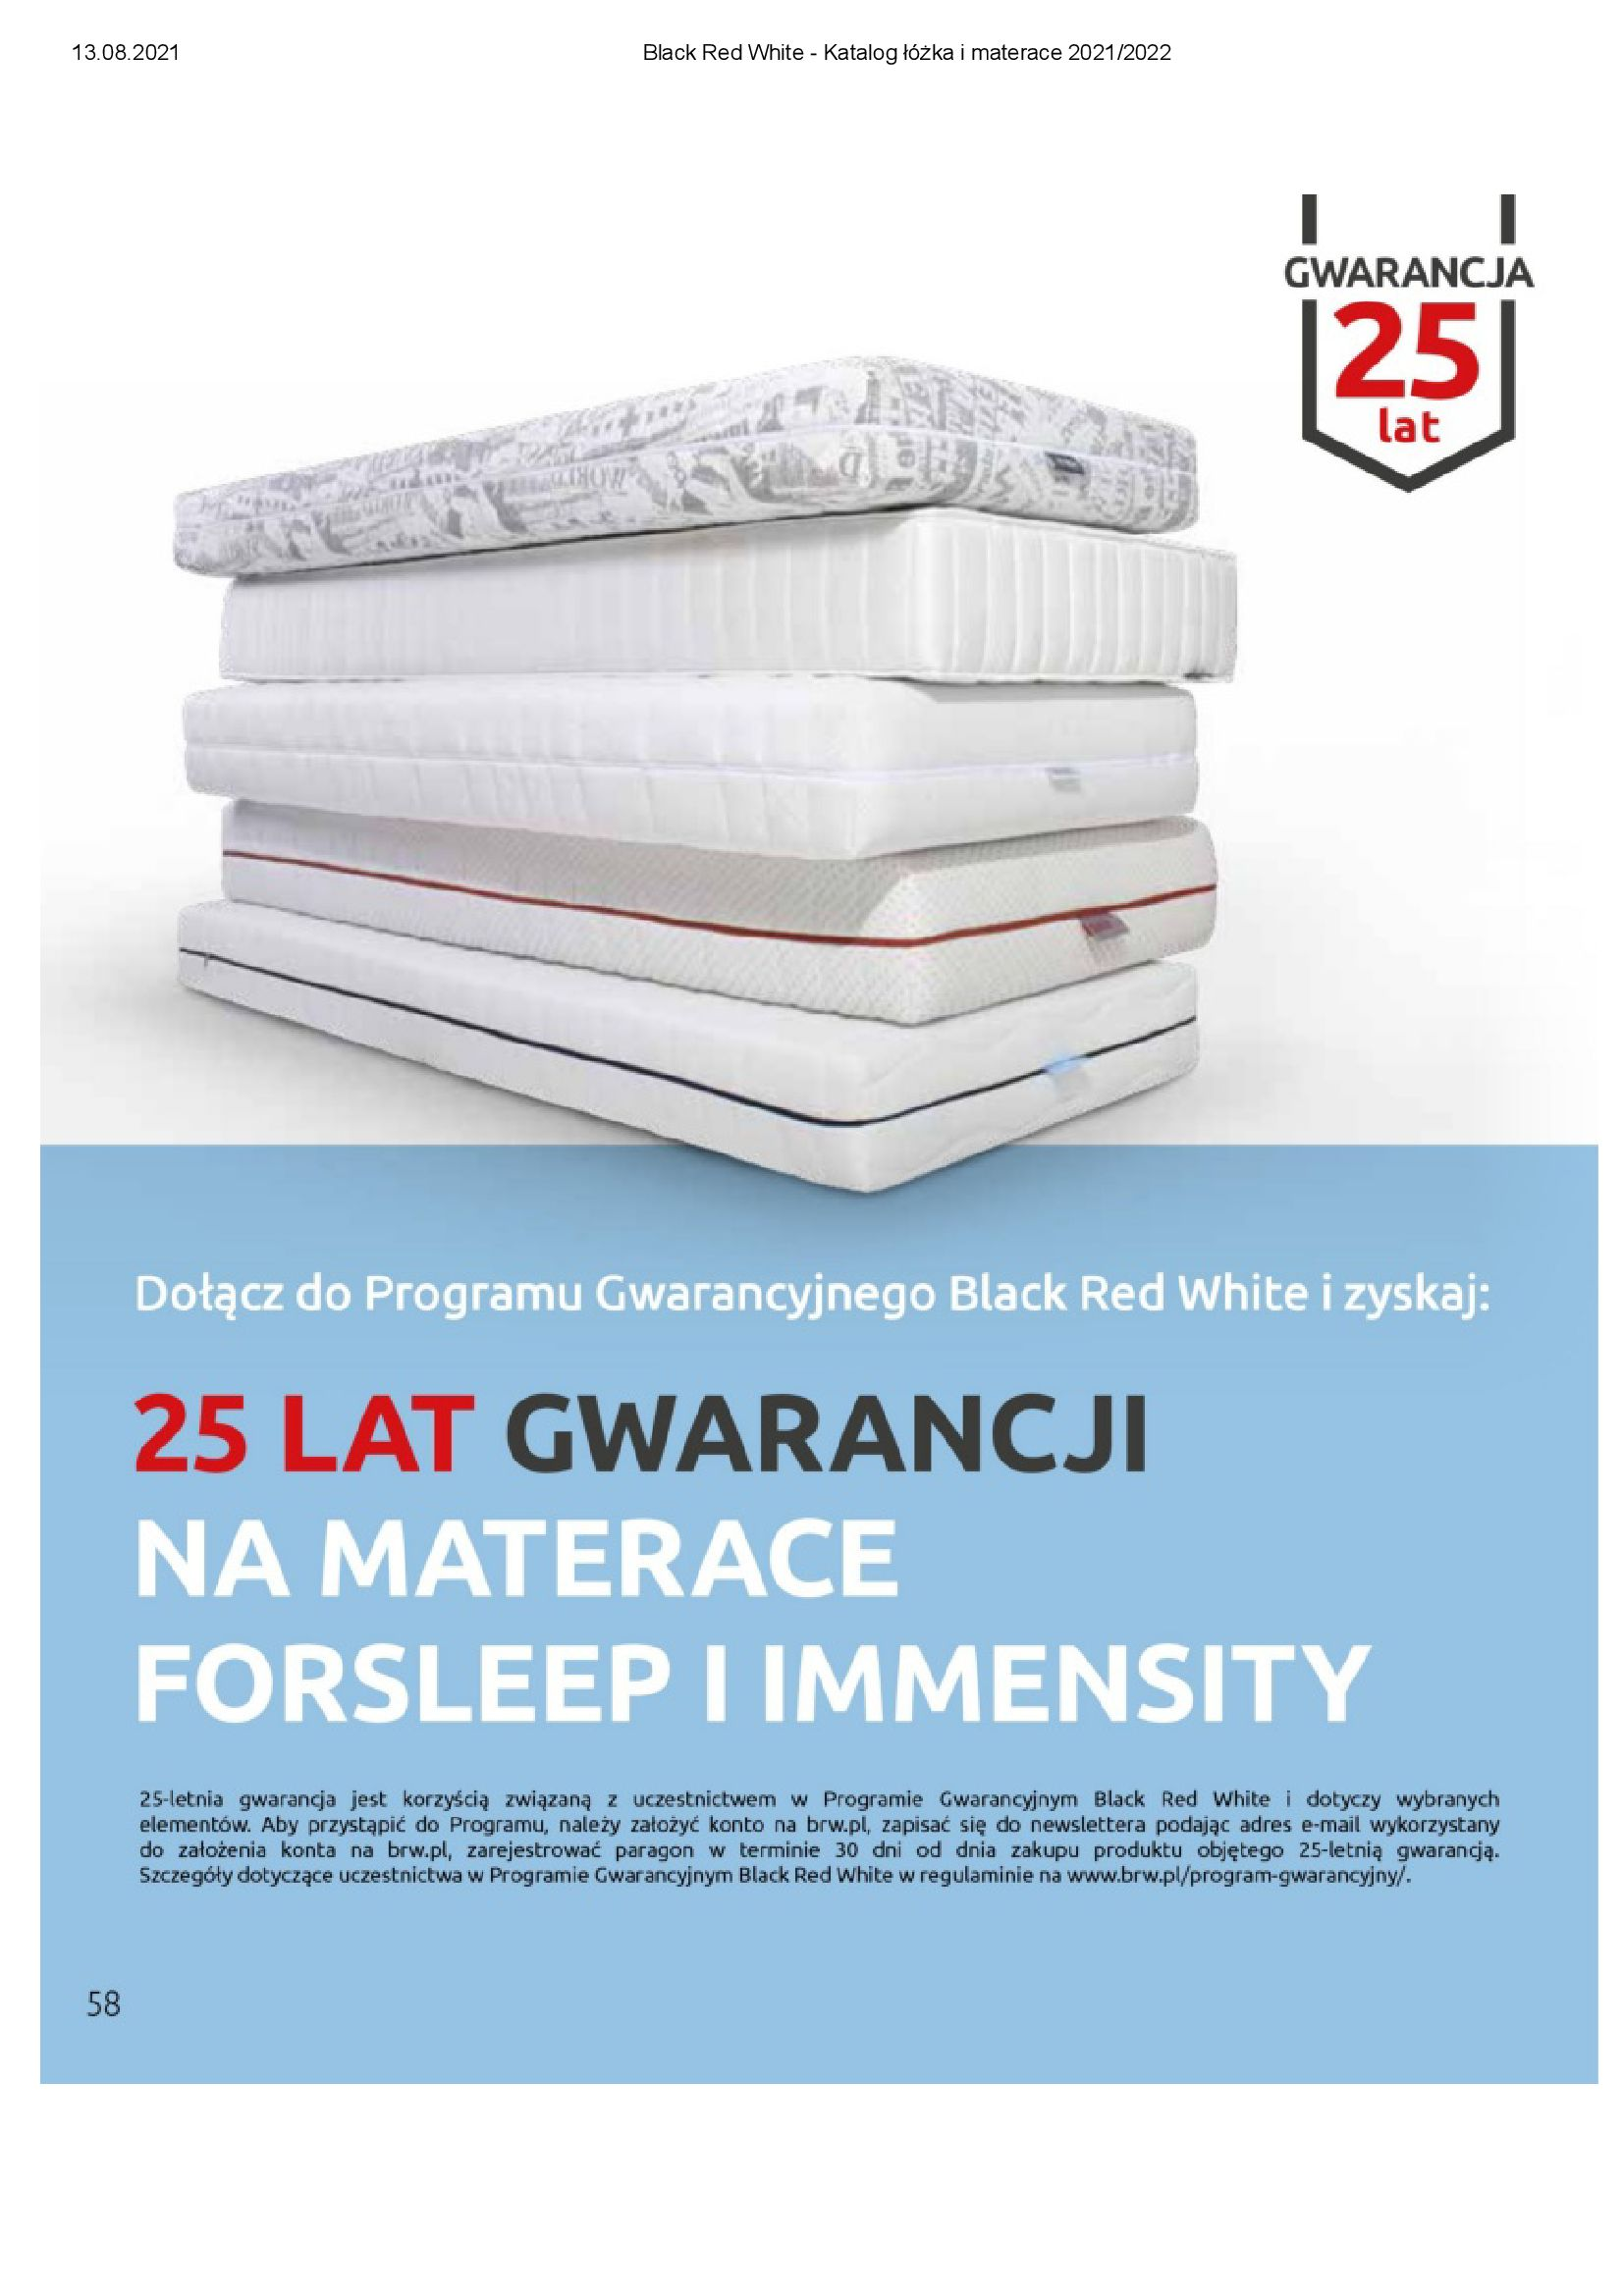 Gazetka Black Red White: Katalog Black Red White - Łóżka i Materace 2021-08-13 page-58